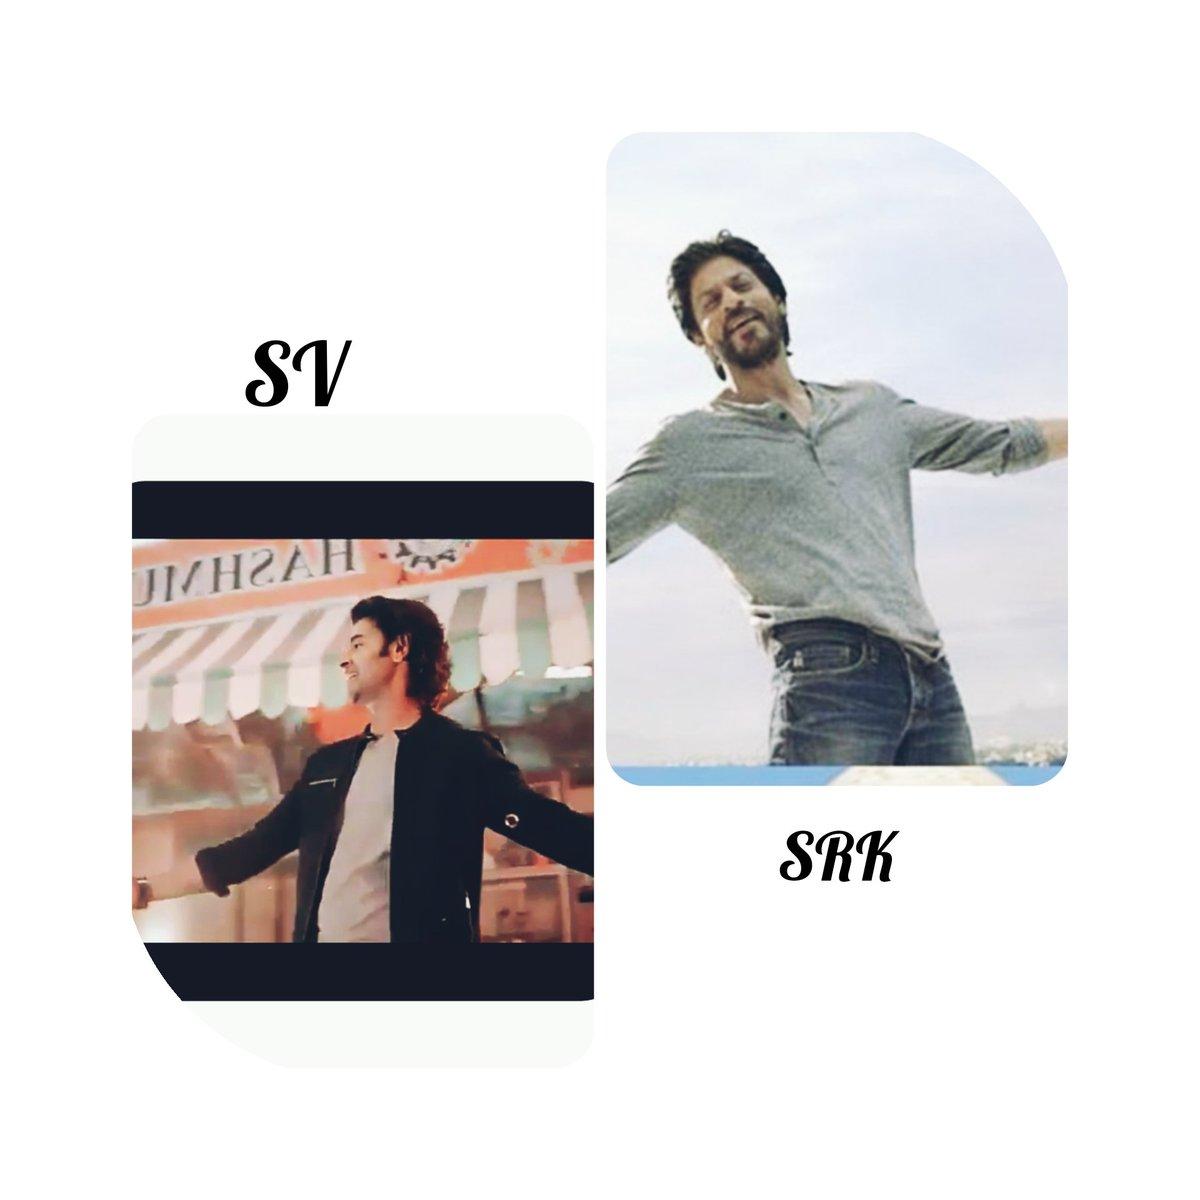 Perfection Begin AND Ends Here @shasha303 🔥 @iamsrk 🔥 #ShashankVyas ⭐ #ShahRukhKhan ⭐